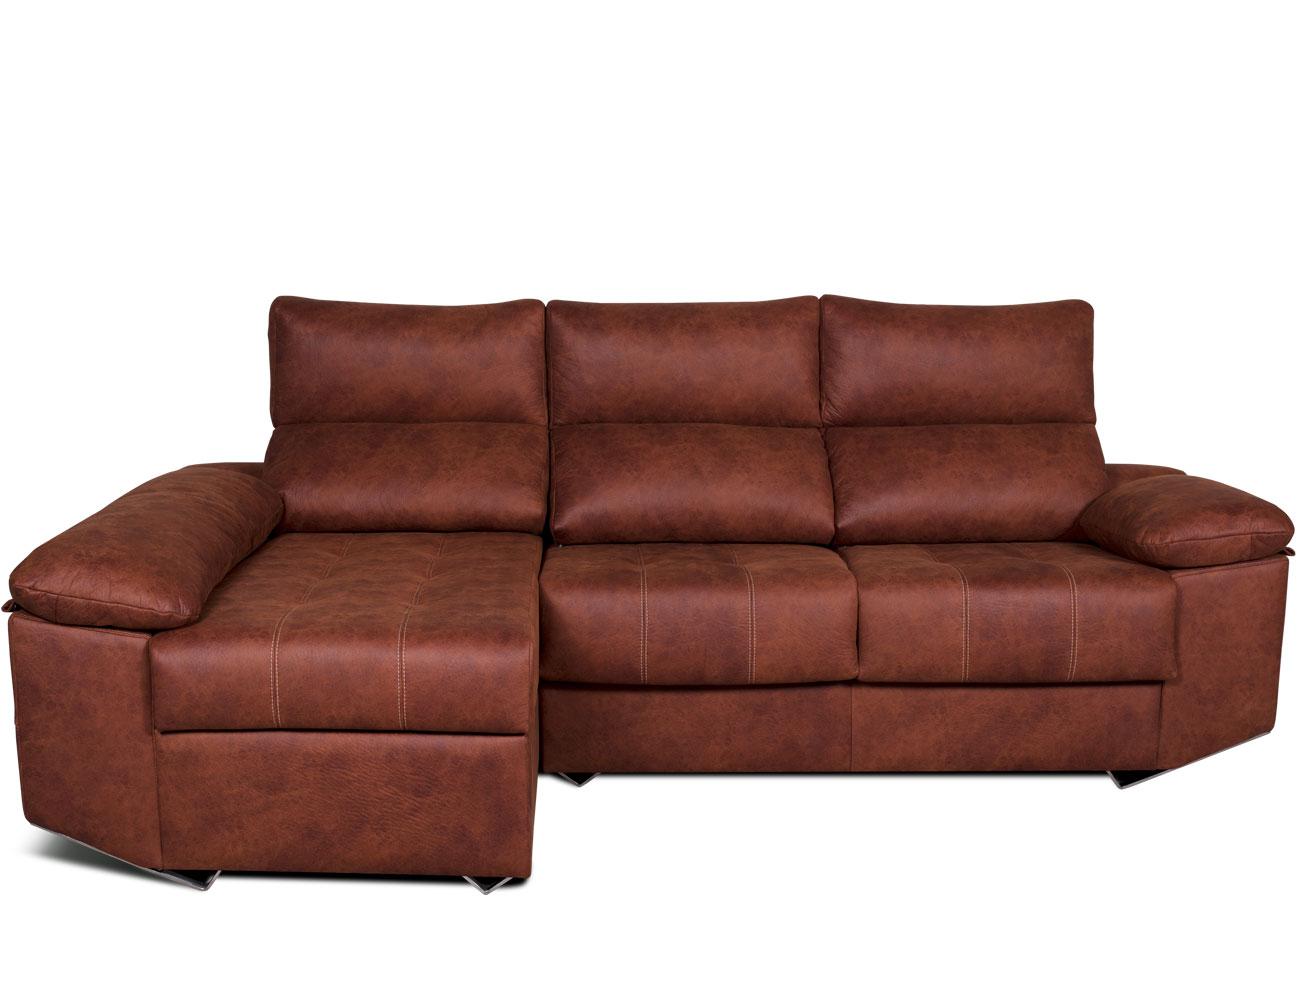 Sofa chaiselongue moderno patas forma tejido anti manchas 24